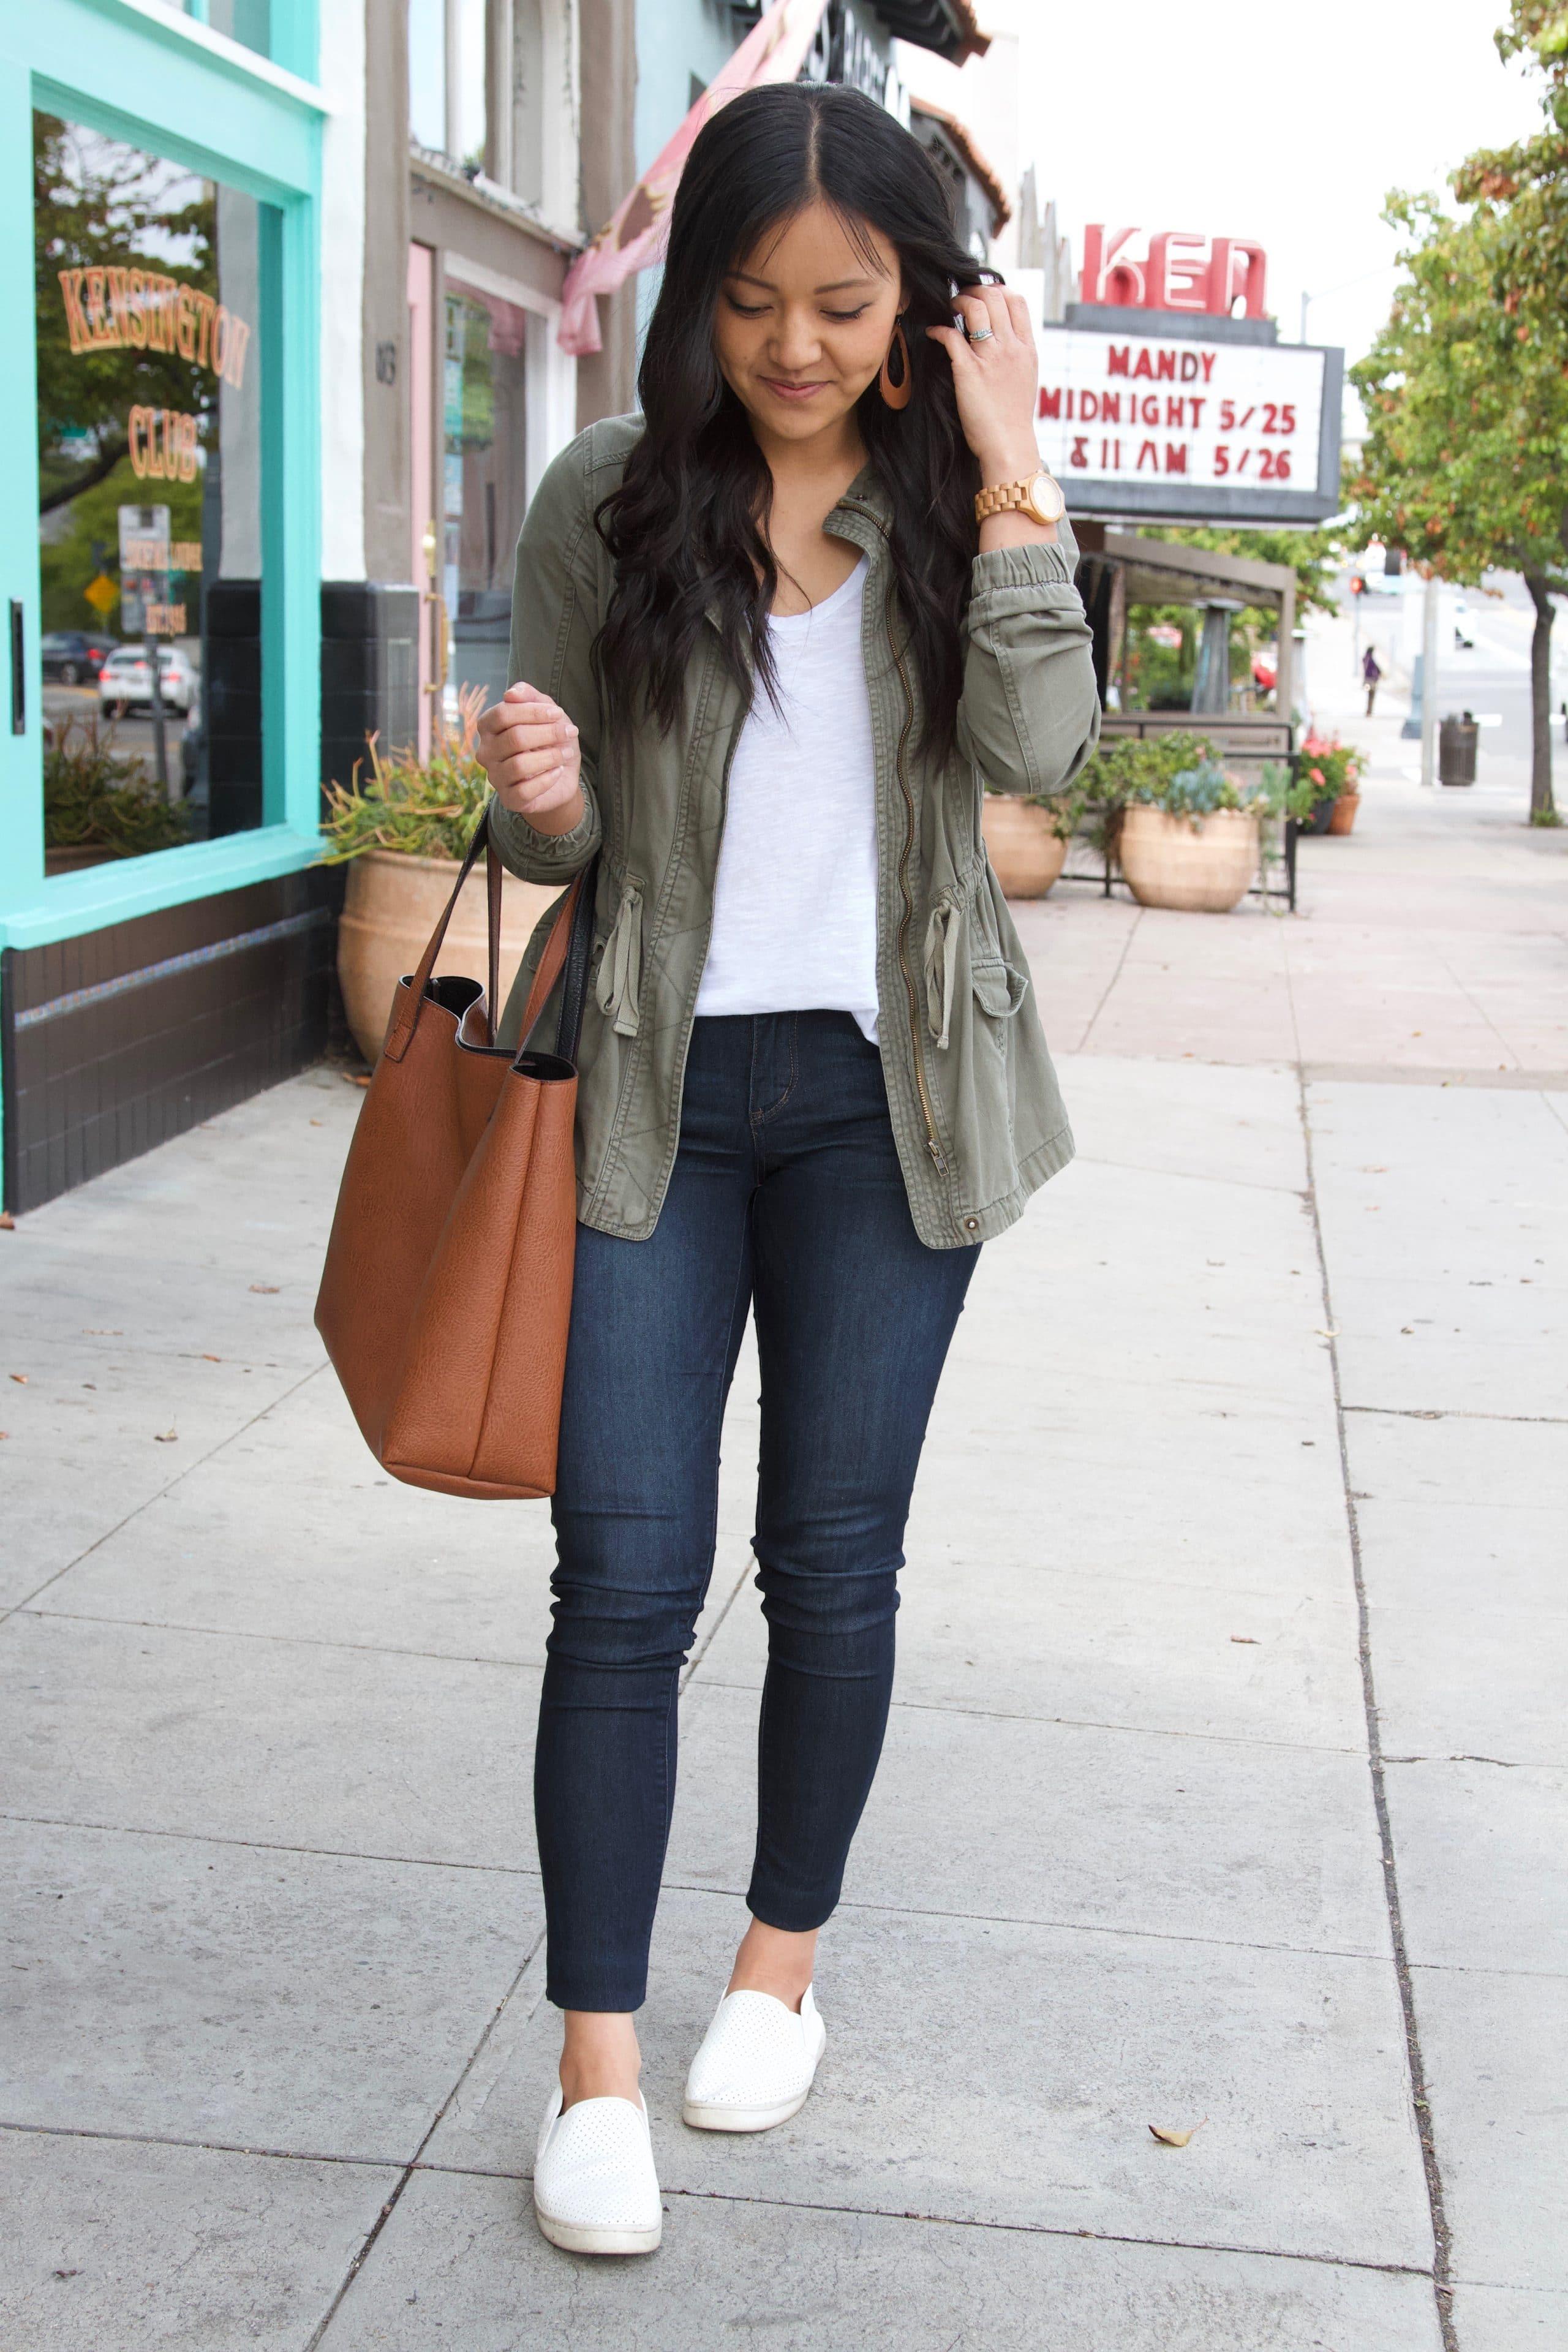 white tee + skinny jeans + white sneakers + utility jacket + brown tote